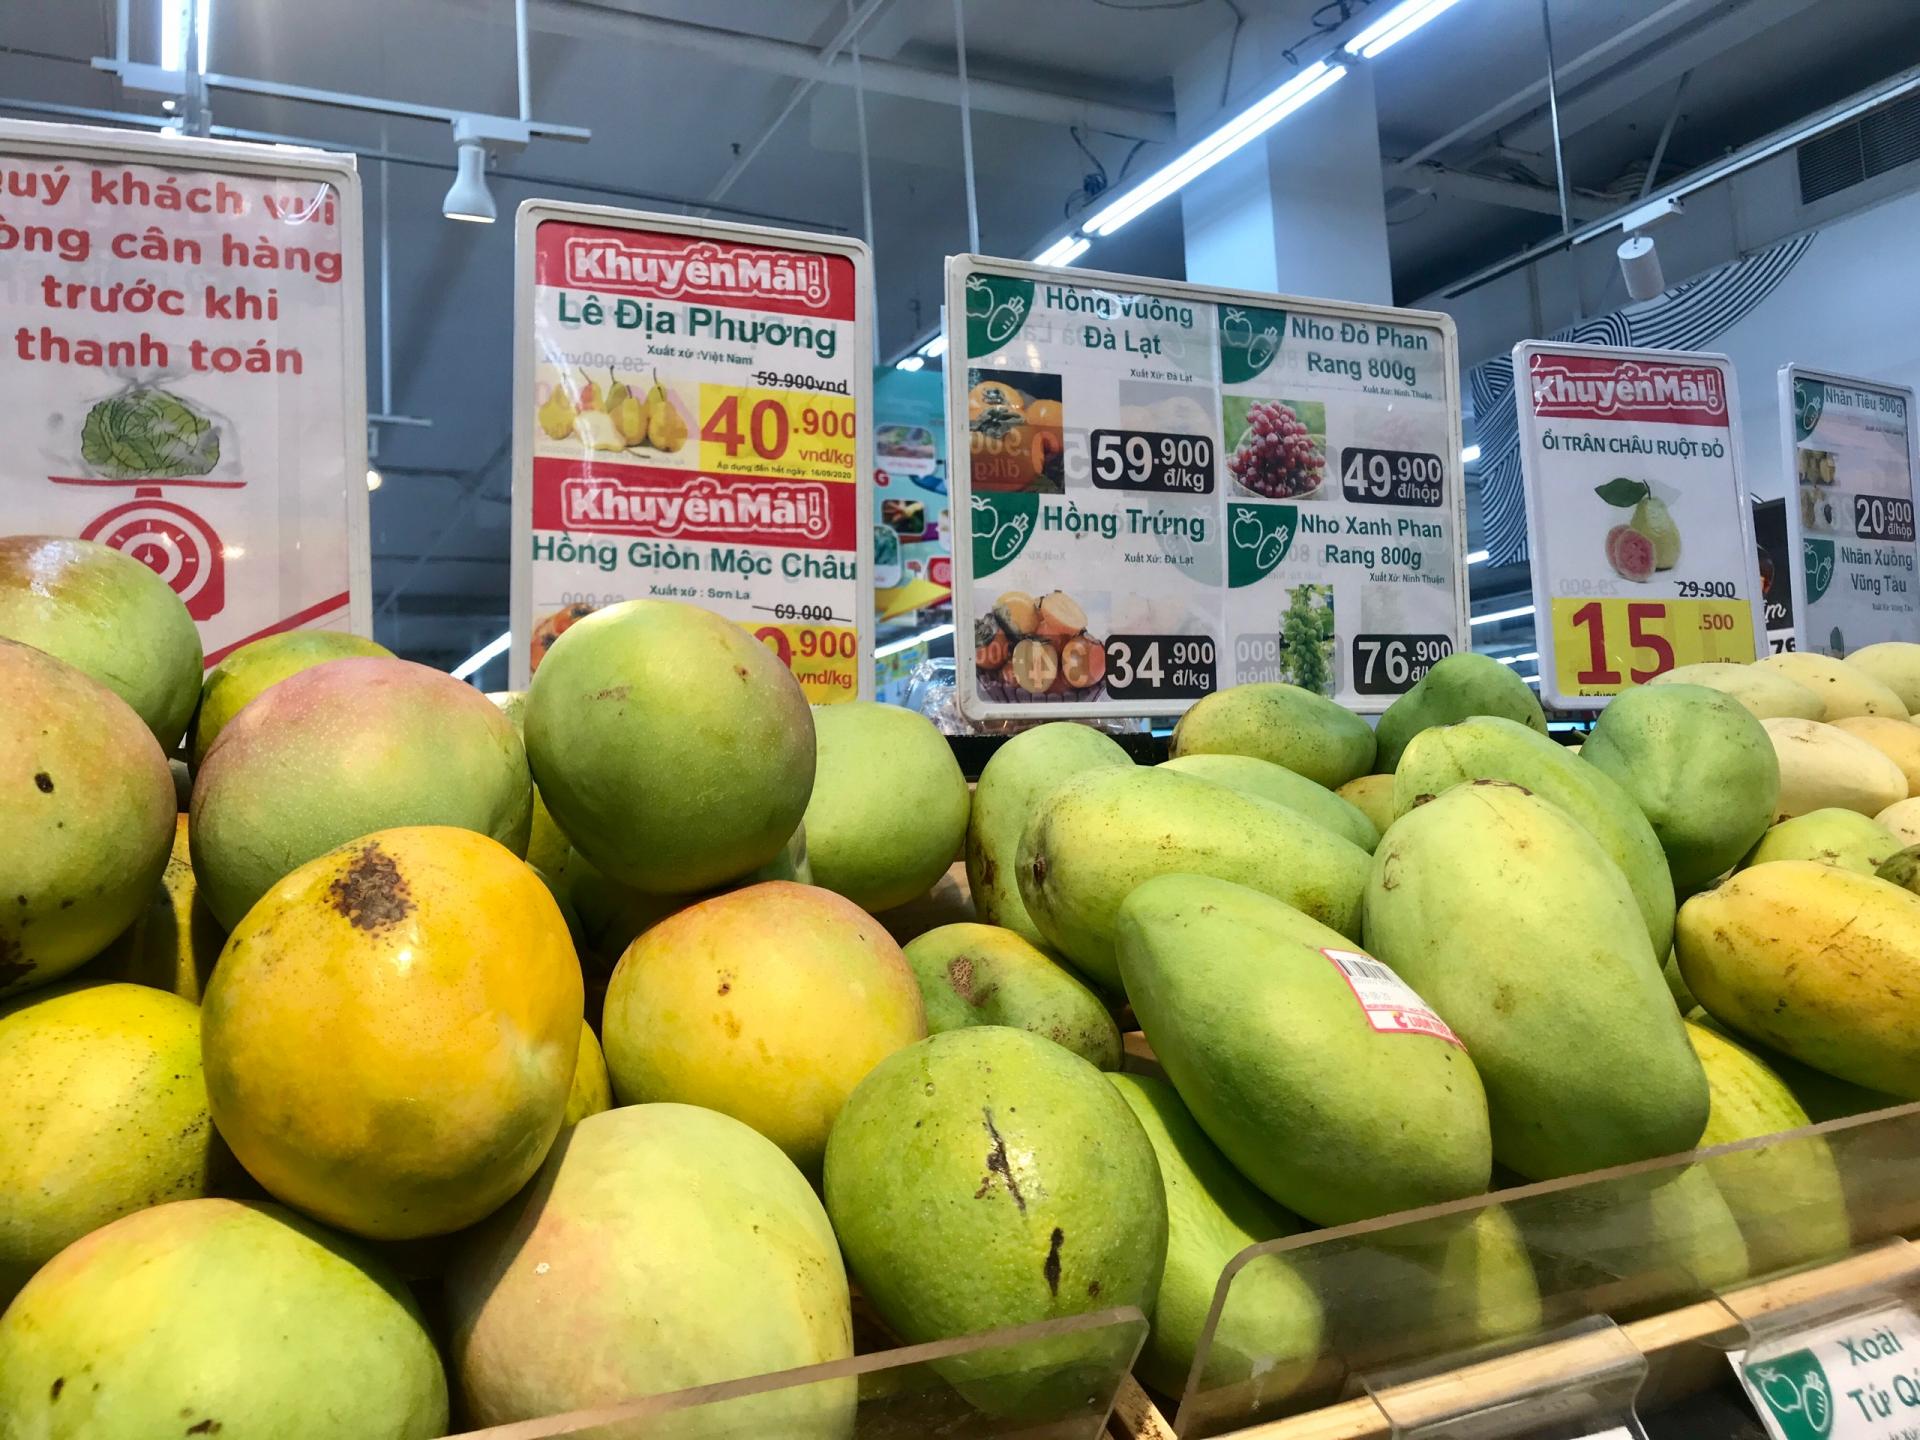 vietnamese mango exports to us enjoying robust increase